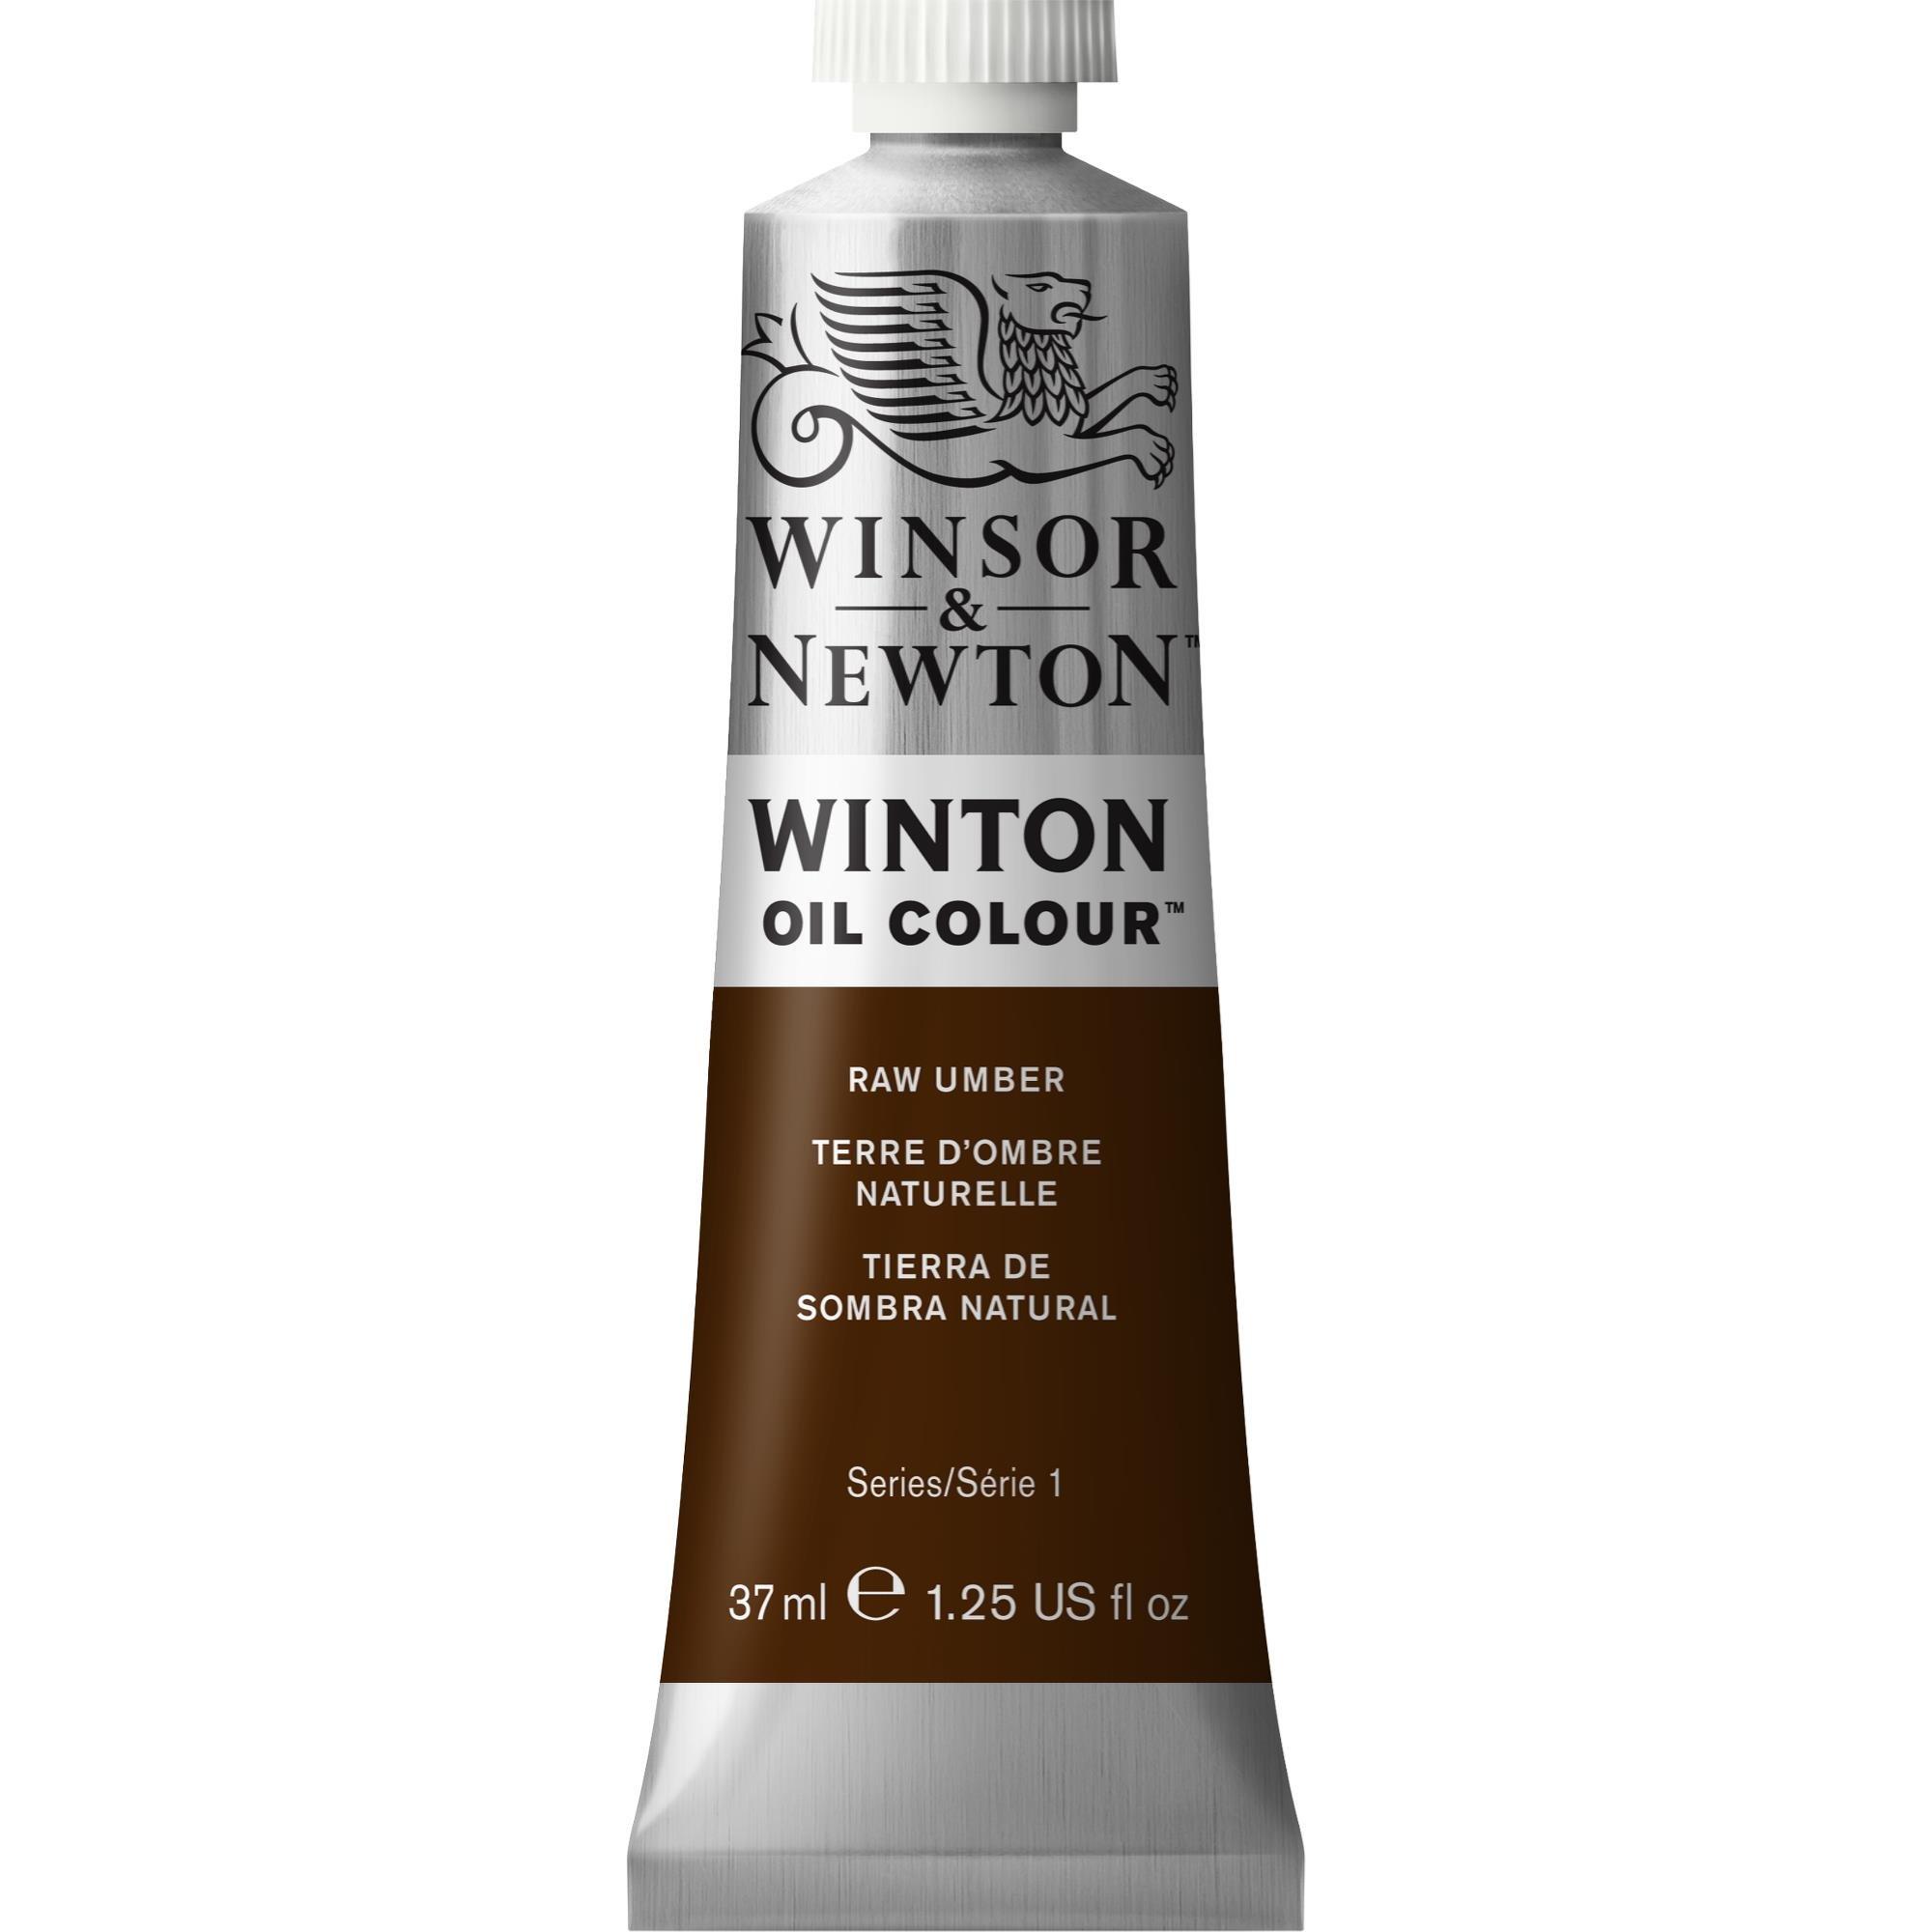 Winsor & Newton Winton Oil Colour Paint, 37ml tube, Raw Umber